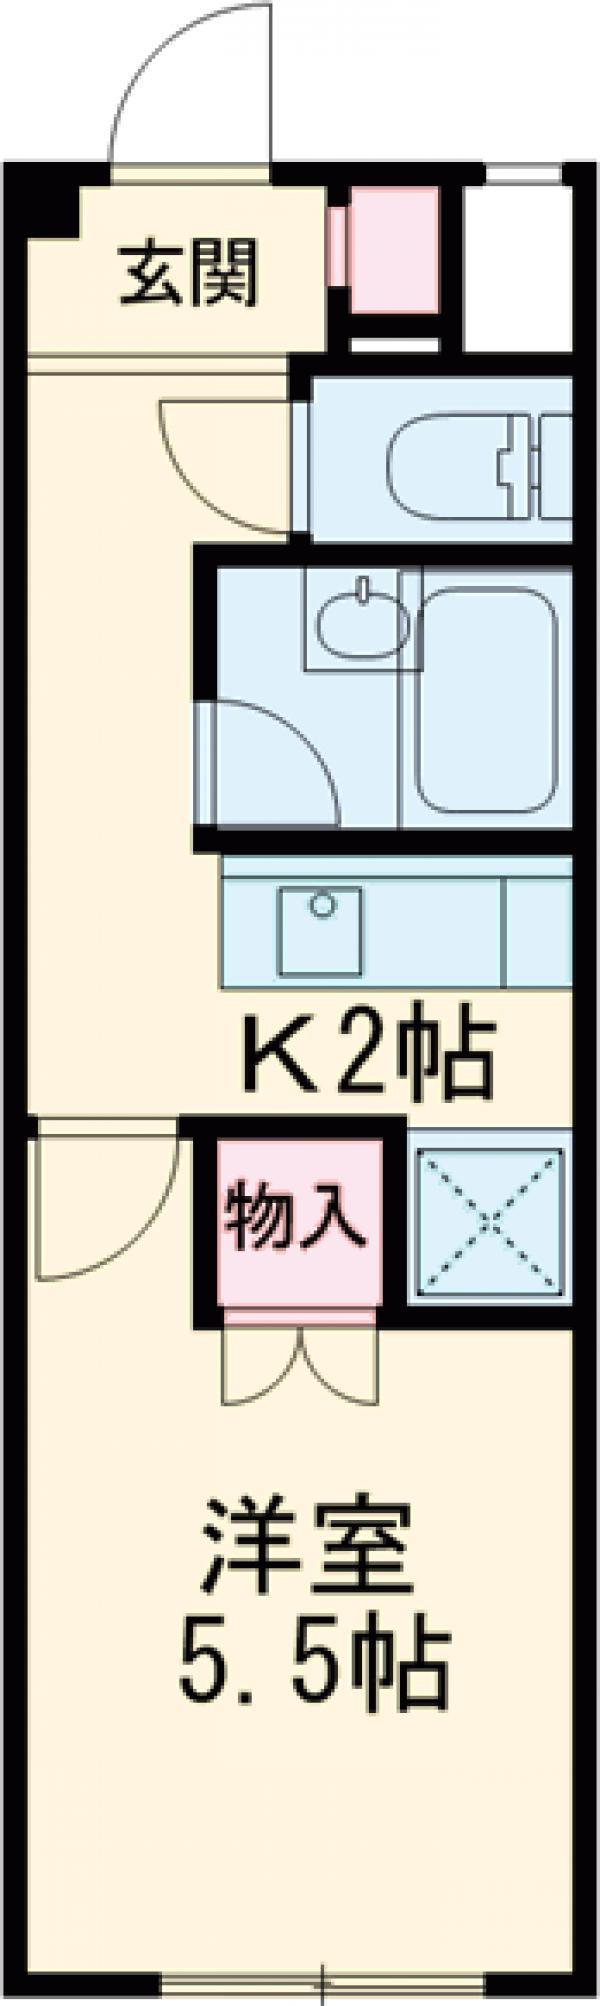 SKK-Ⅷ・106号室の間取り